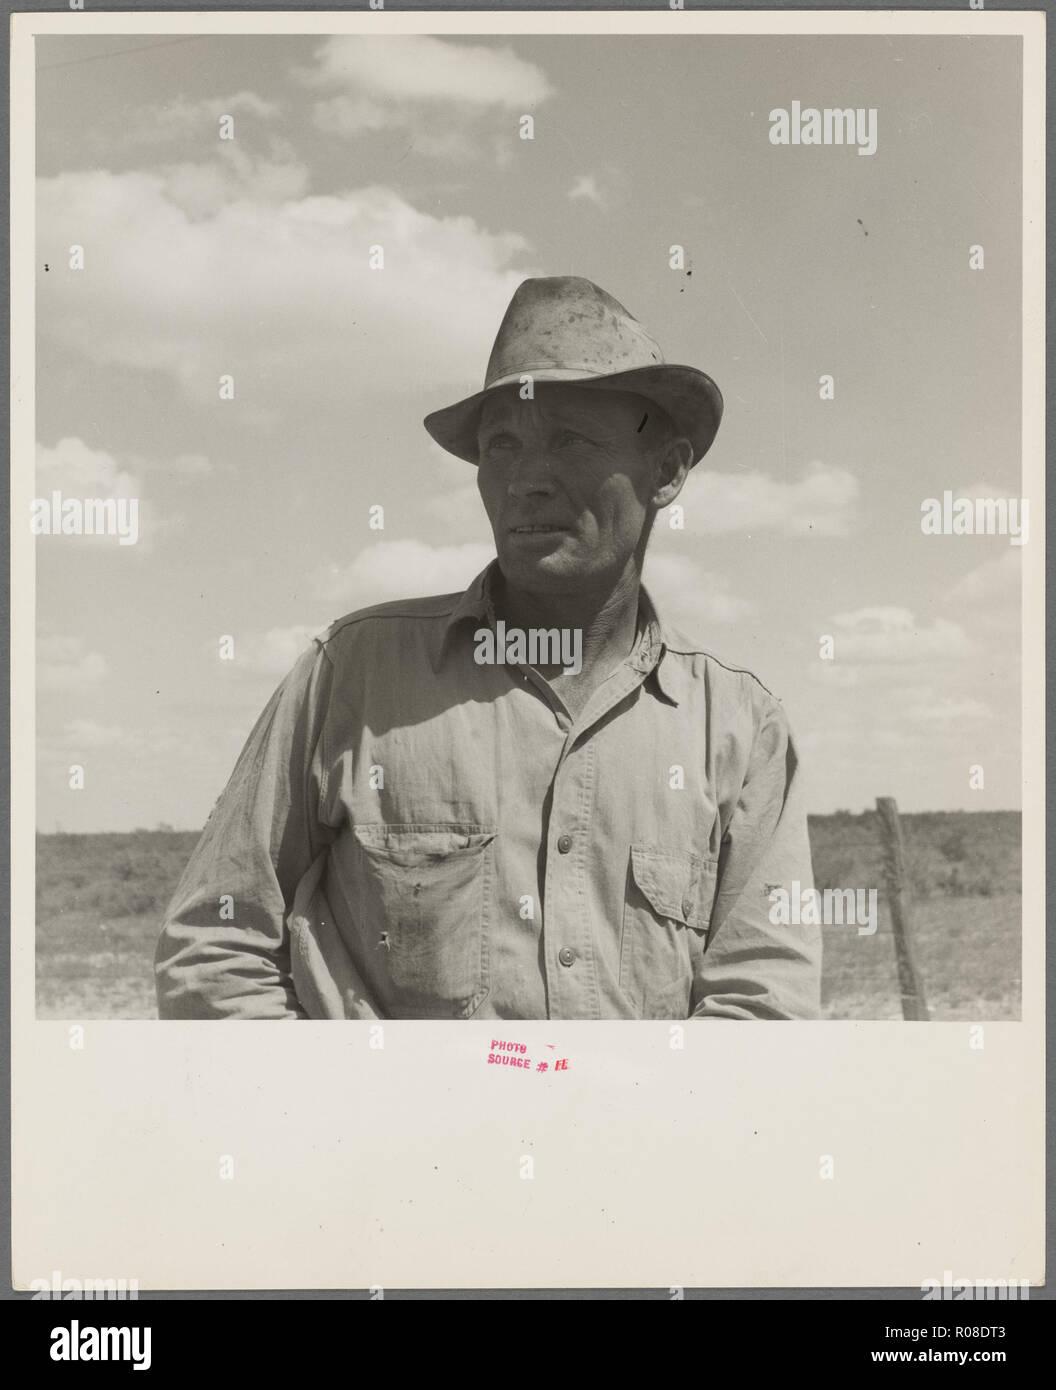 vintage american depression era photograph - Stock Image